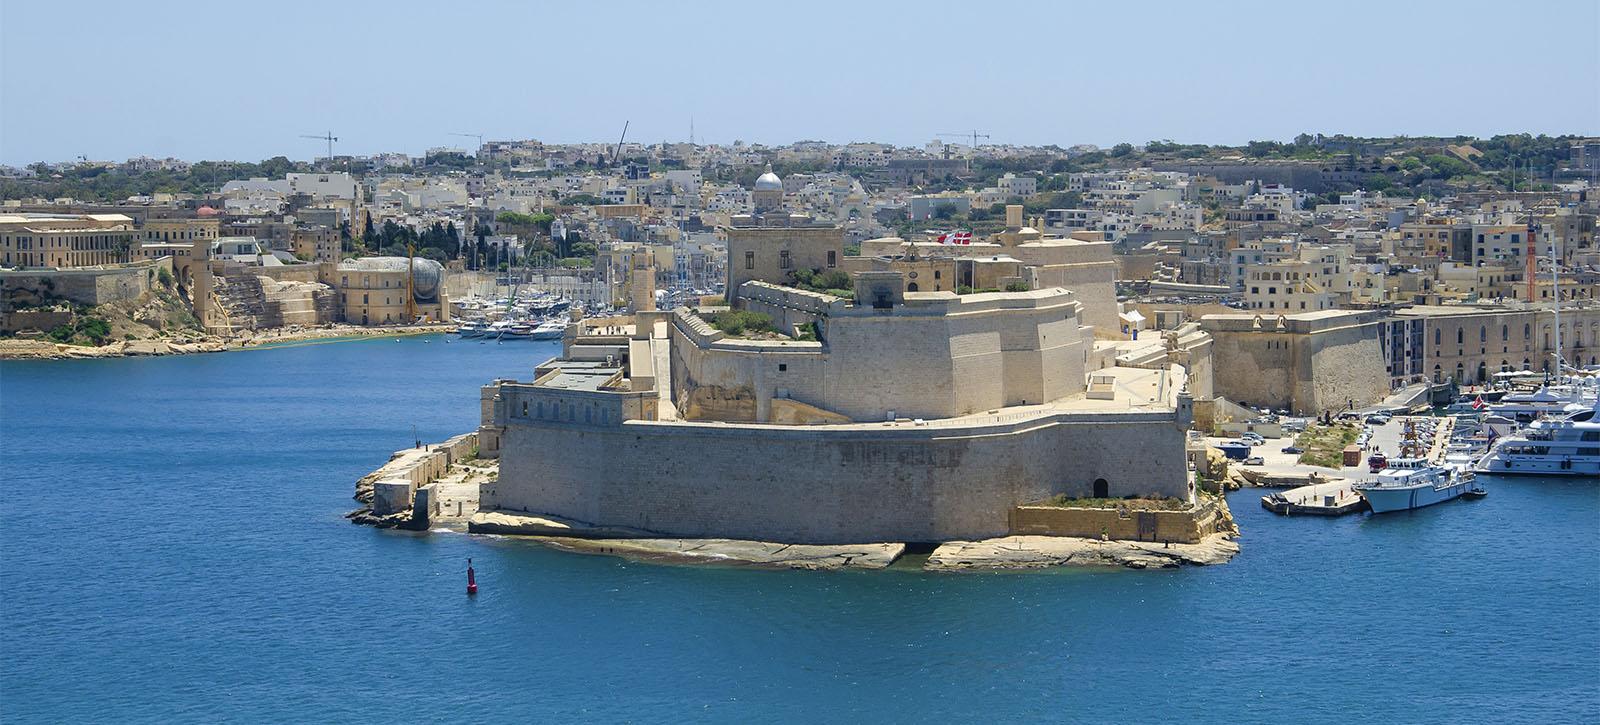 Malta Citizenship by Investment Program from €1.2 million.